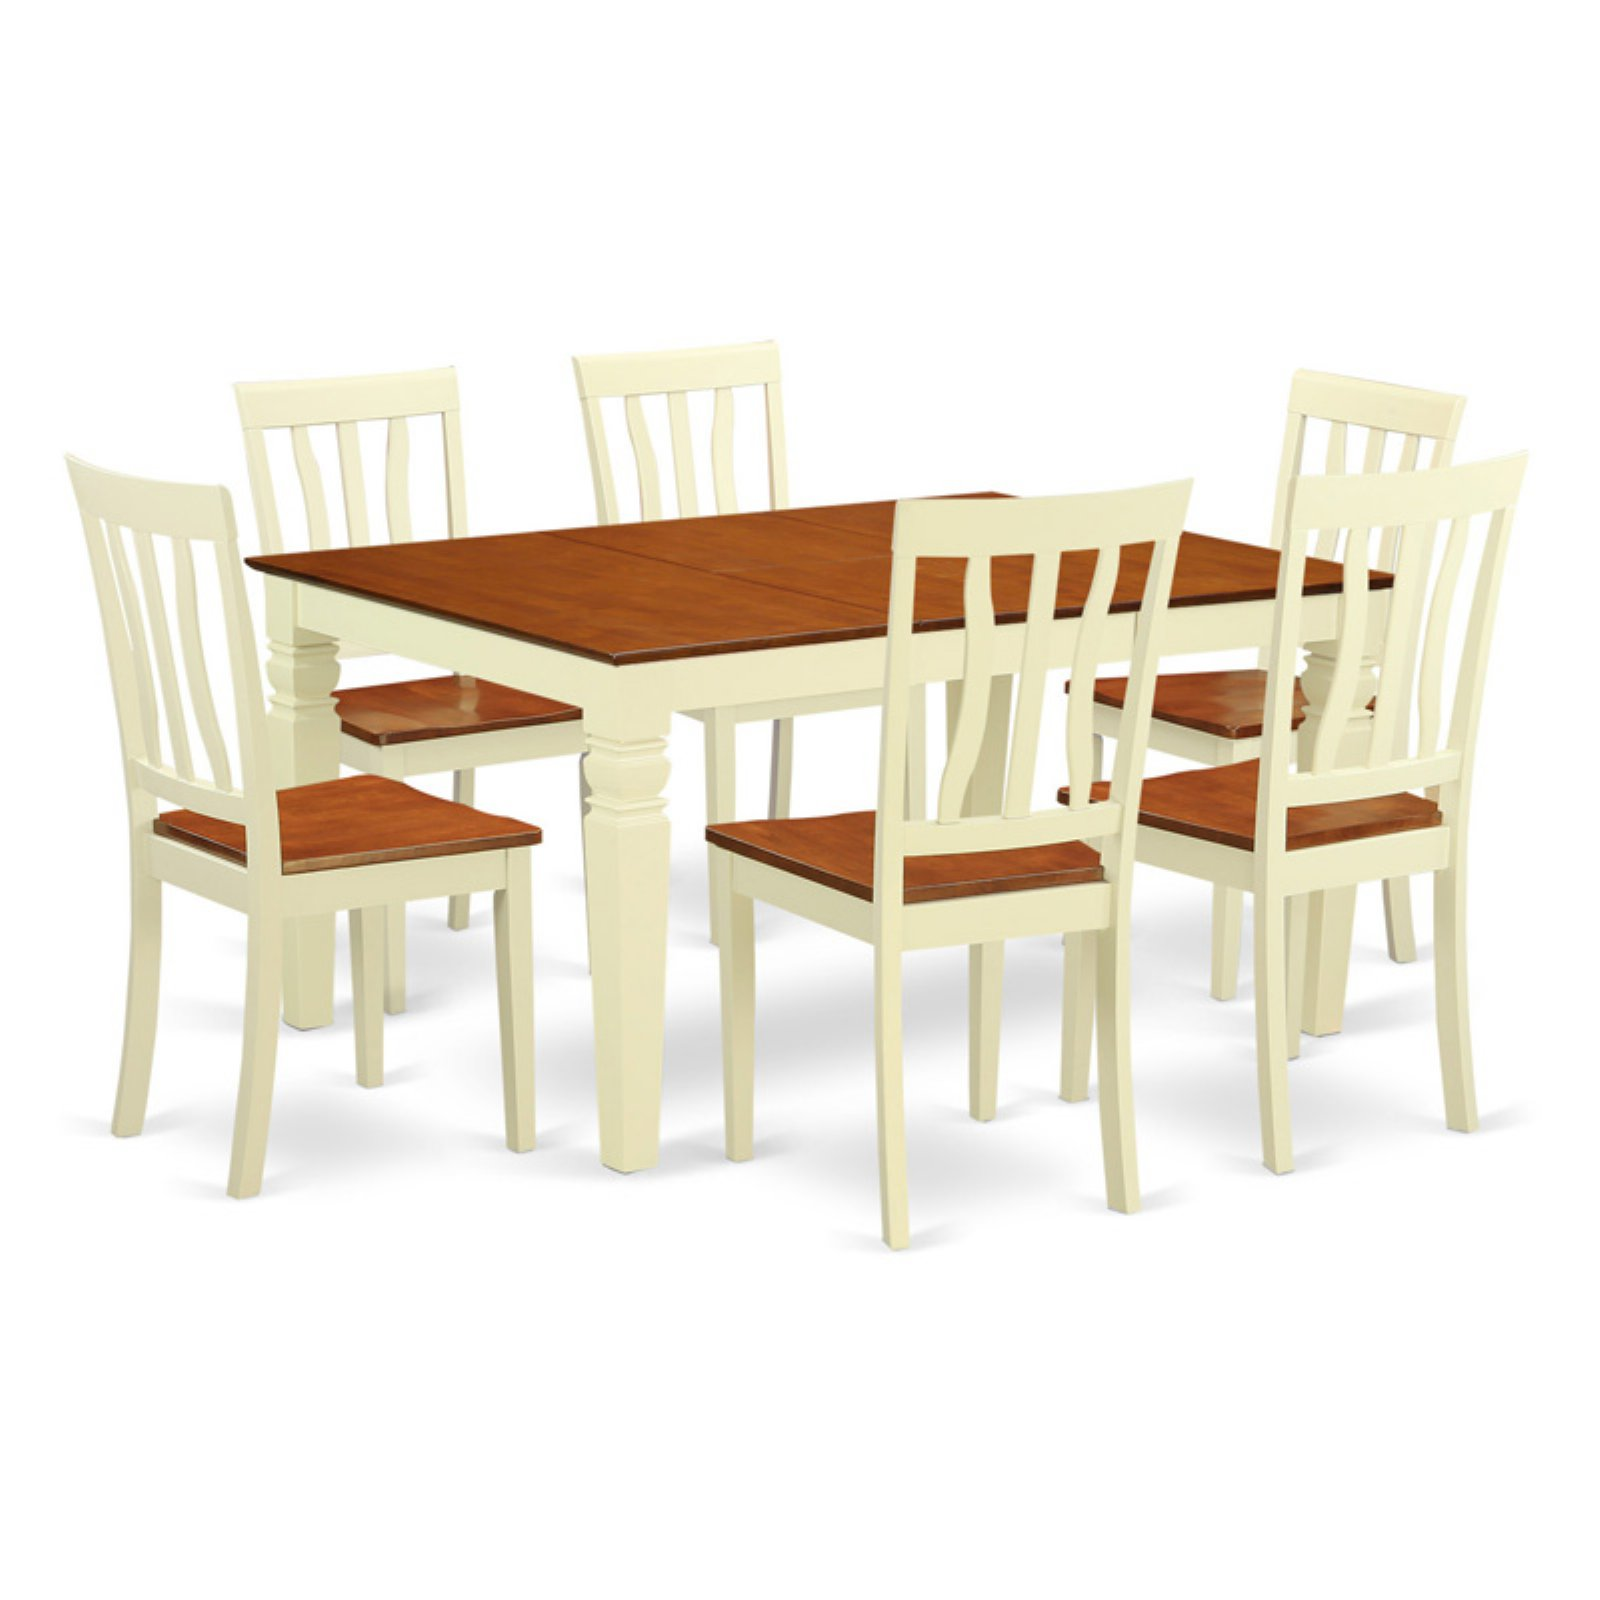 East West Furniture Weston 7 Piece Splat Back Dining Table Set